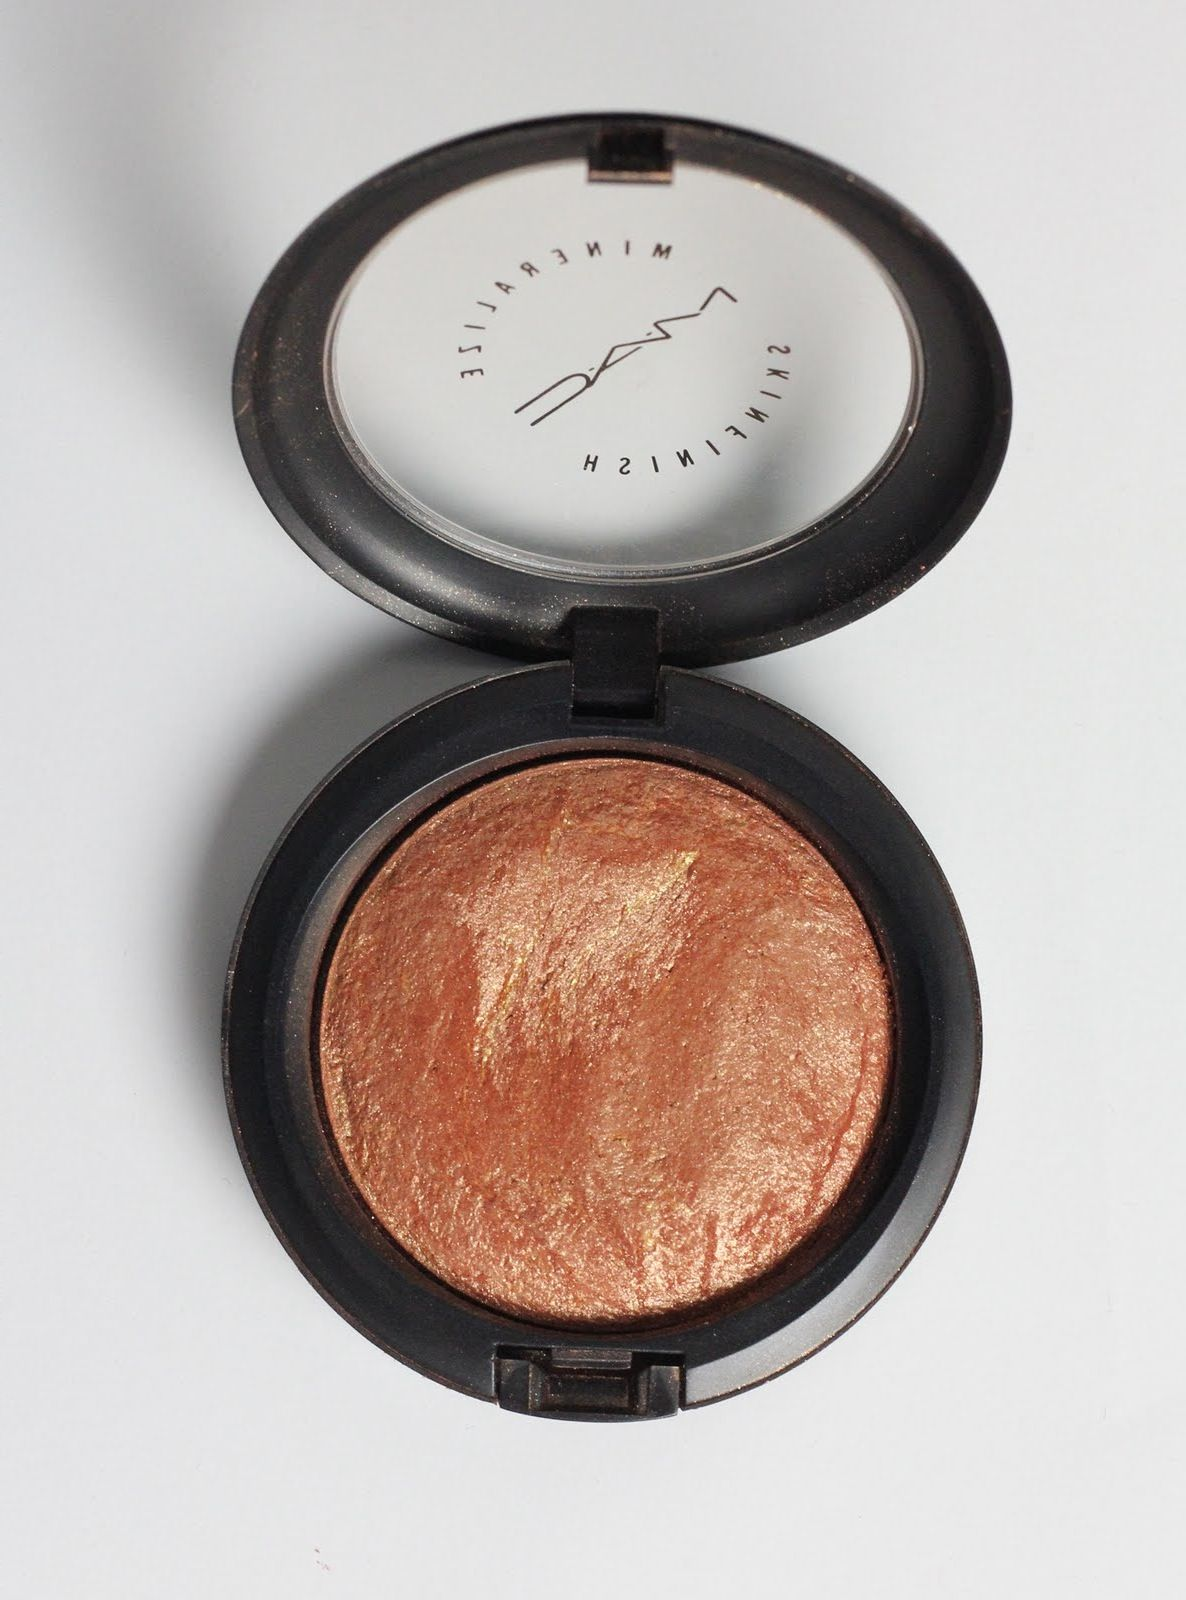 MAC Mineralize Skin Finish in Cheeky Bronze  :  this is soooo pretty !!!!